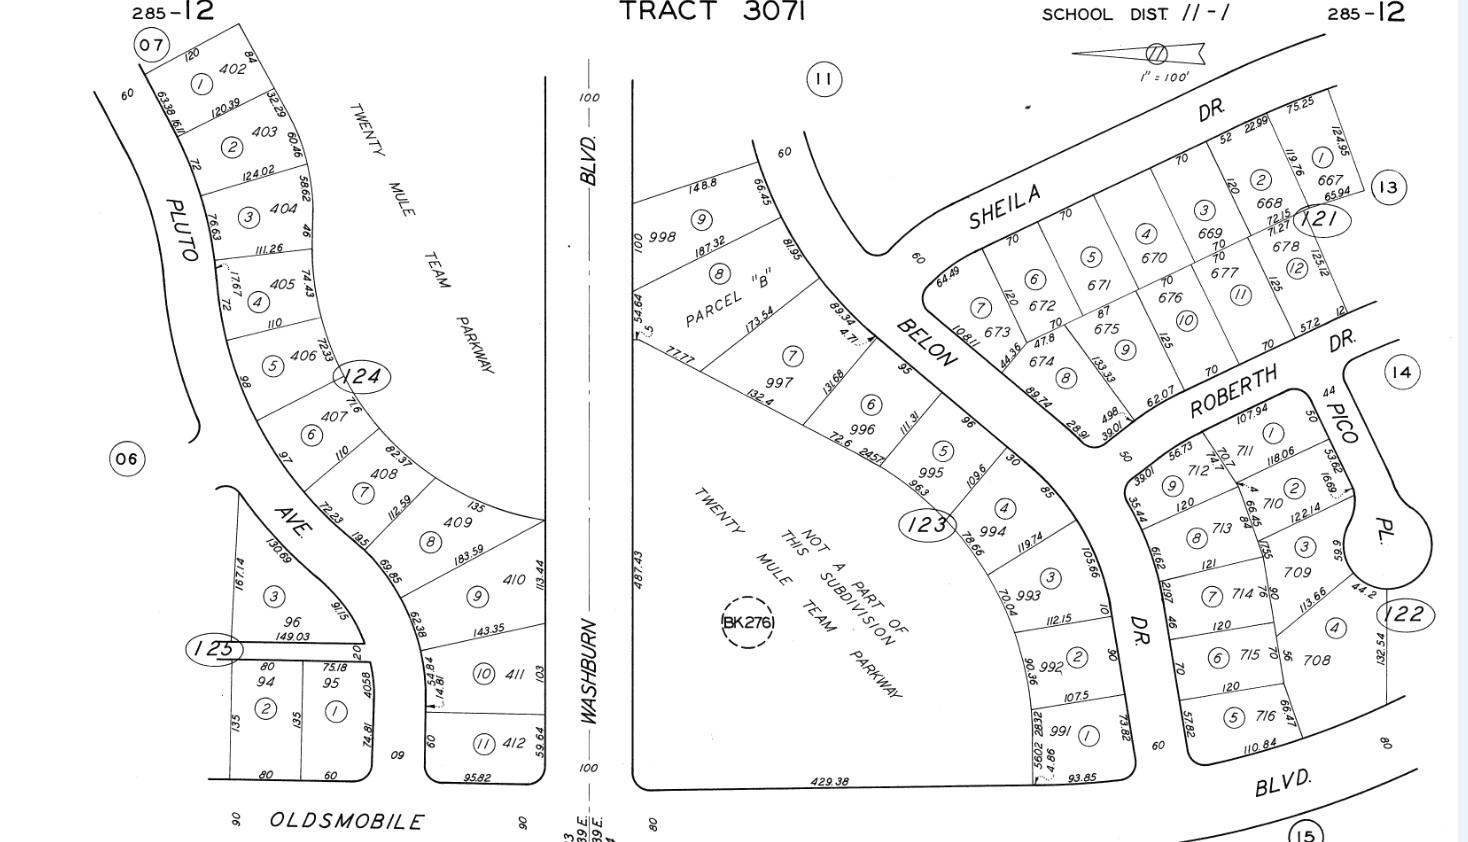 6338 sundown drive 32244 - 8 Plat Map